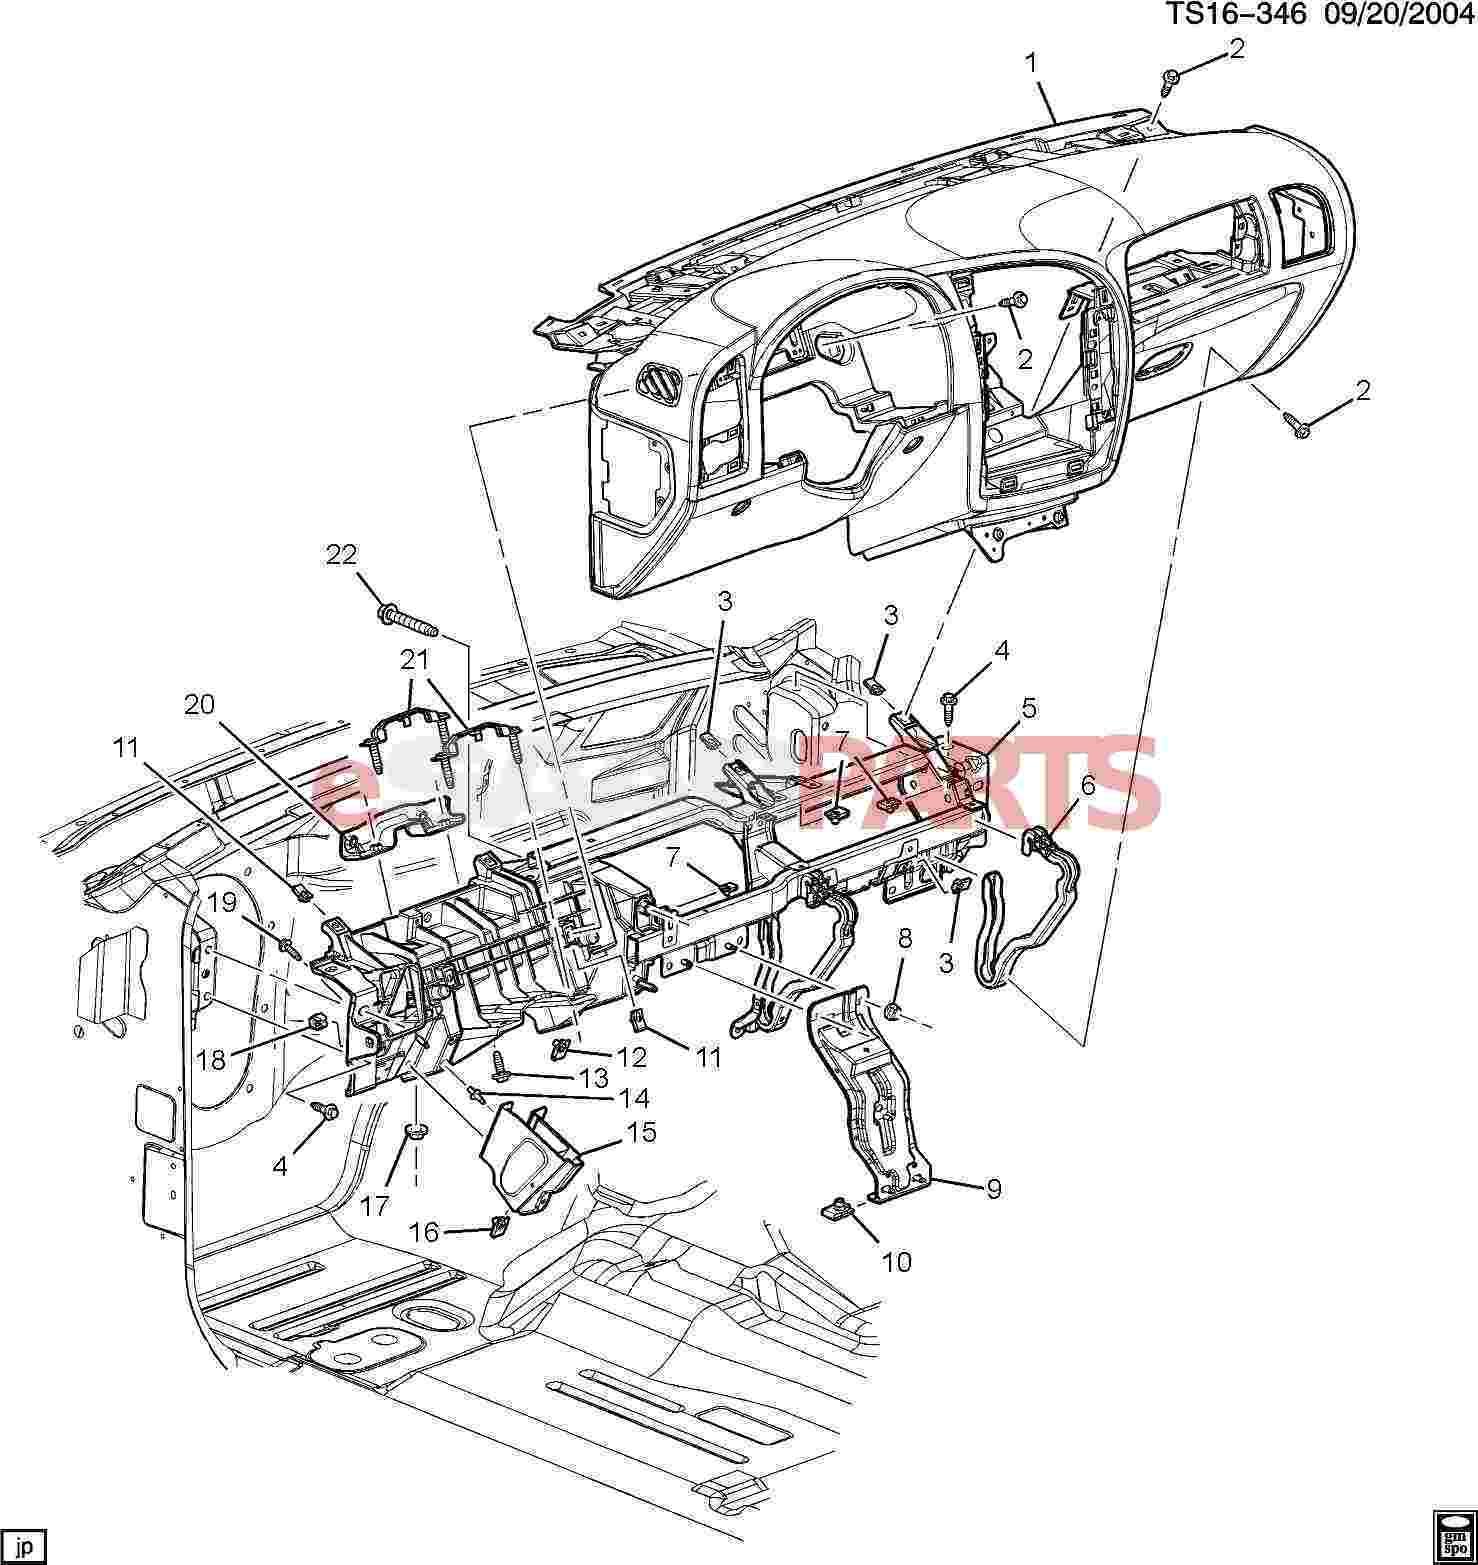 Saab Nut Hex With Con Wa M6x1 5 7 Thk 16 Od